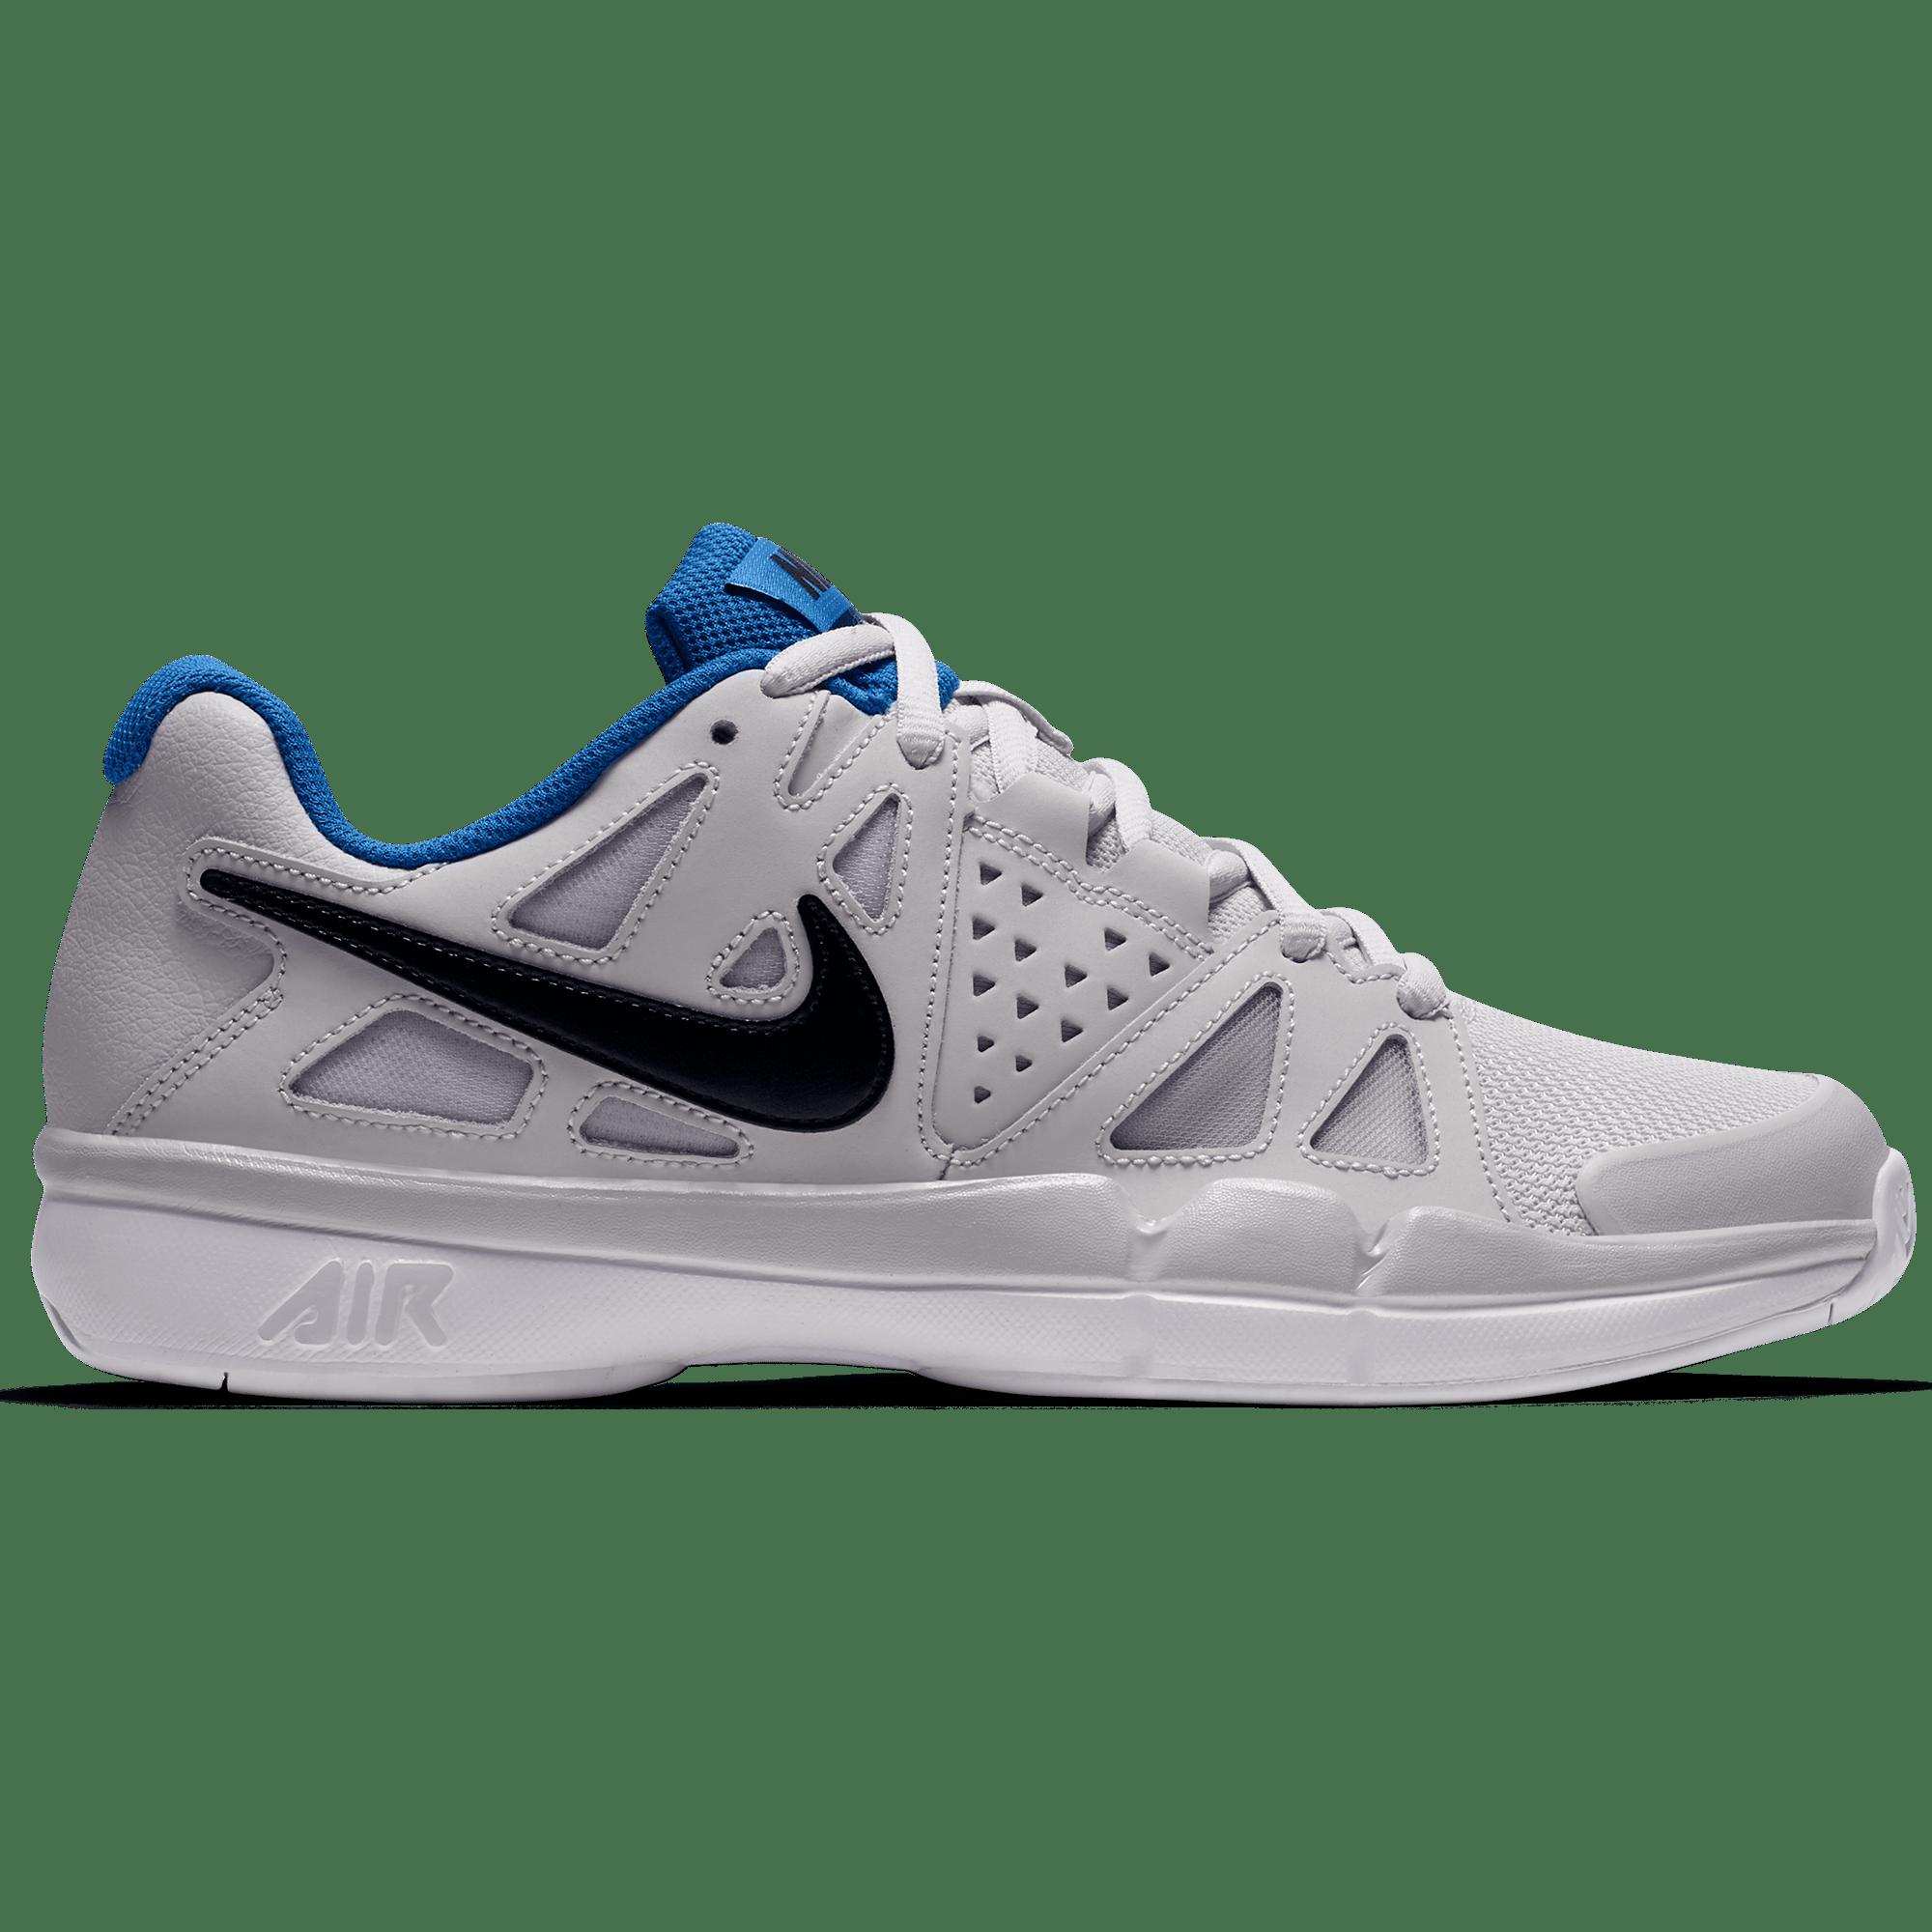 Nike Air Vapor Advantage Men's Tennis